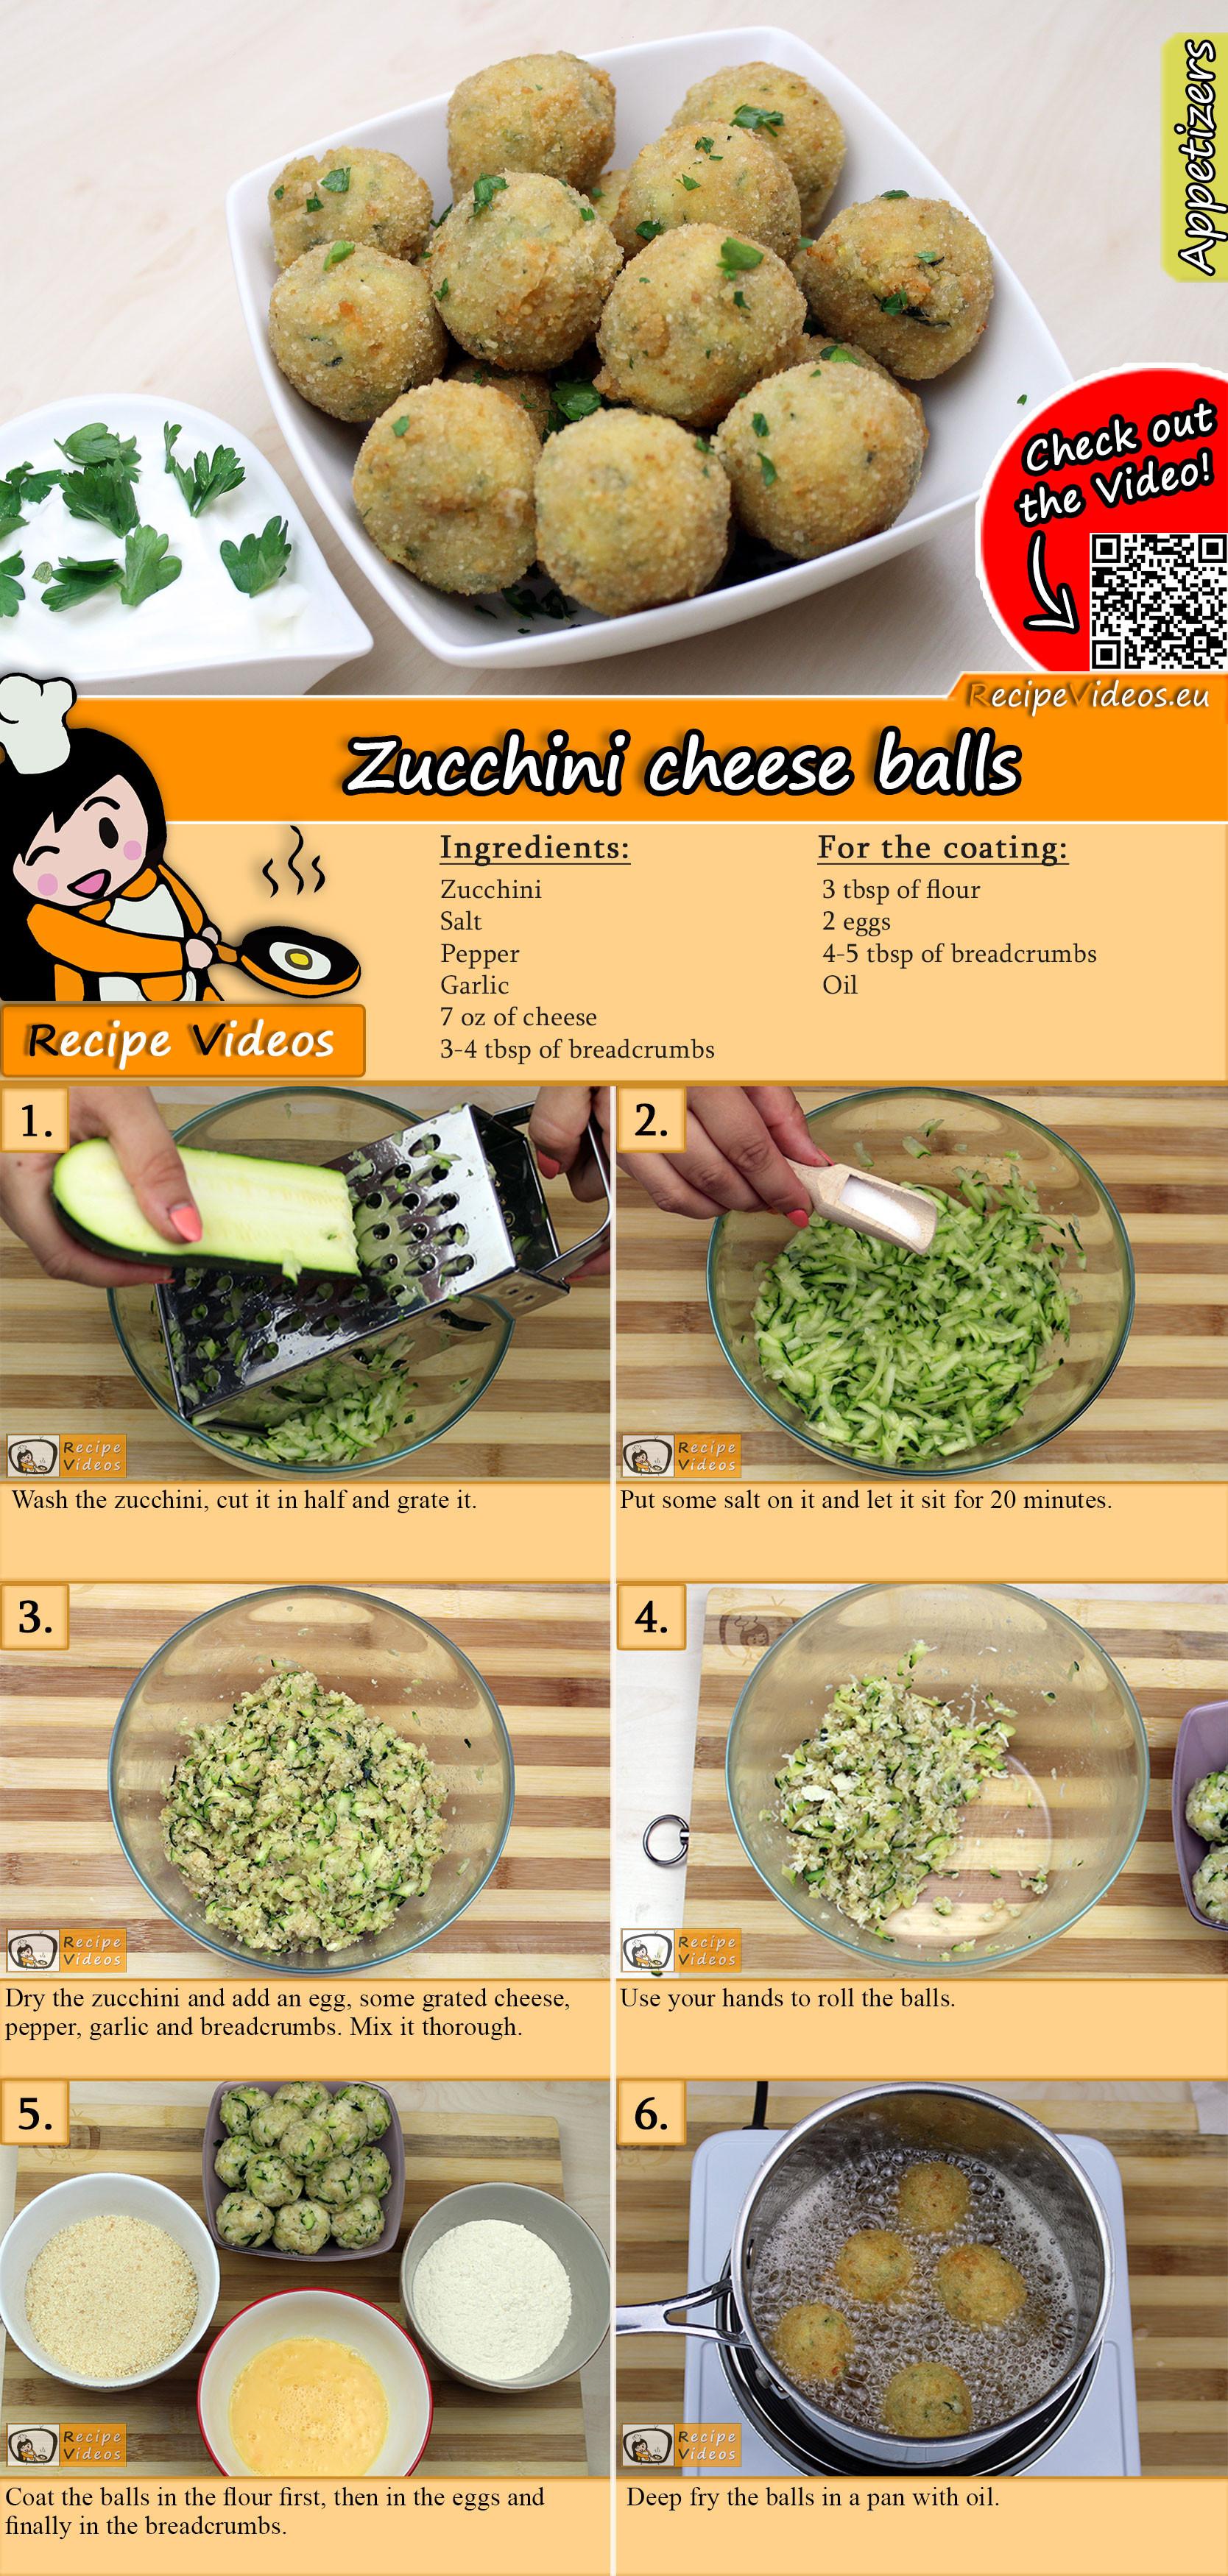 Zucchini cheese balls recipe with video